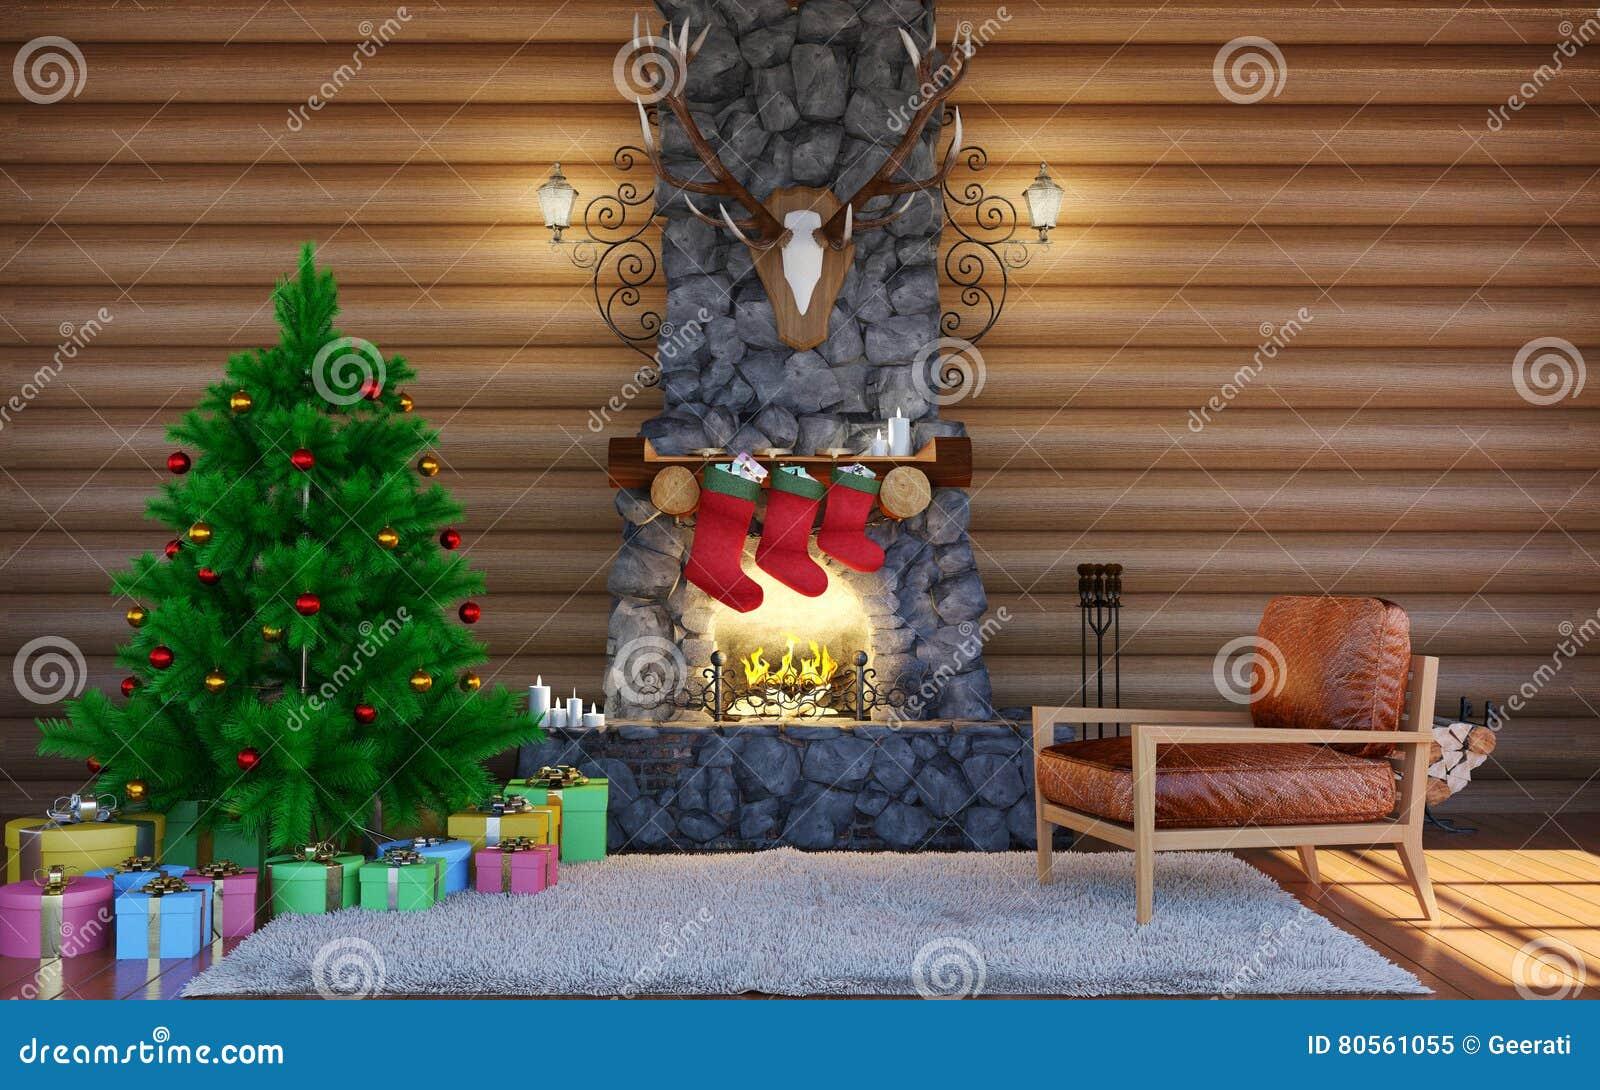 Log Cabin Christmas.Christmas Festive Decorations Room Interior In Log Cabin